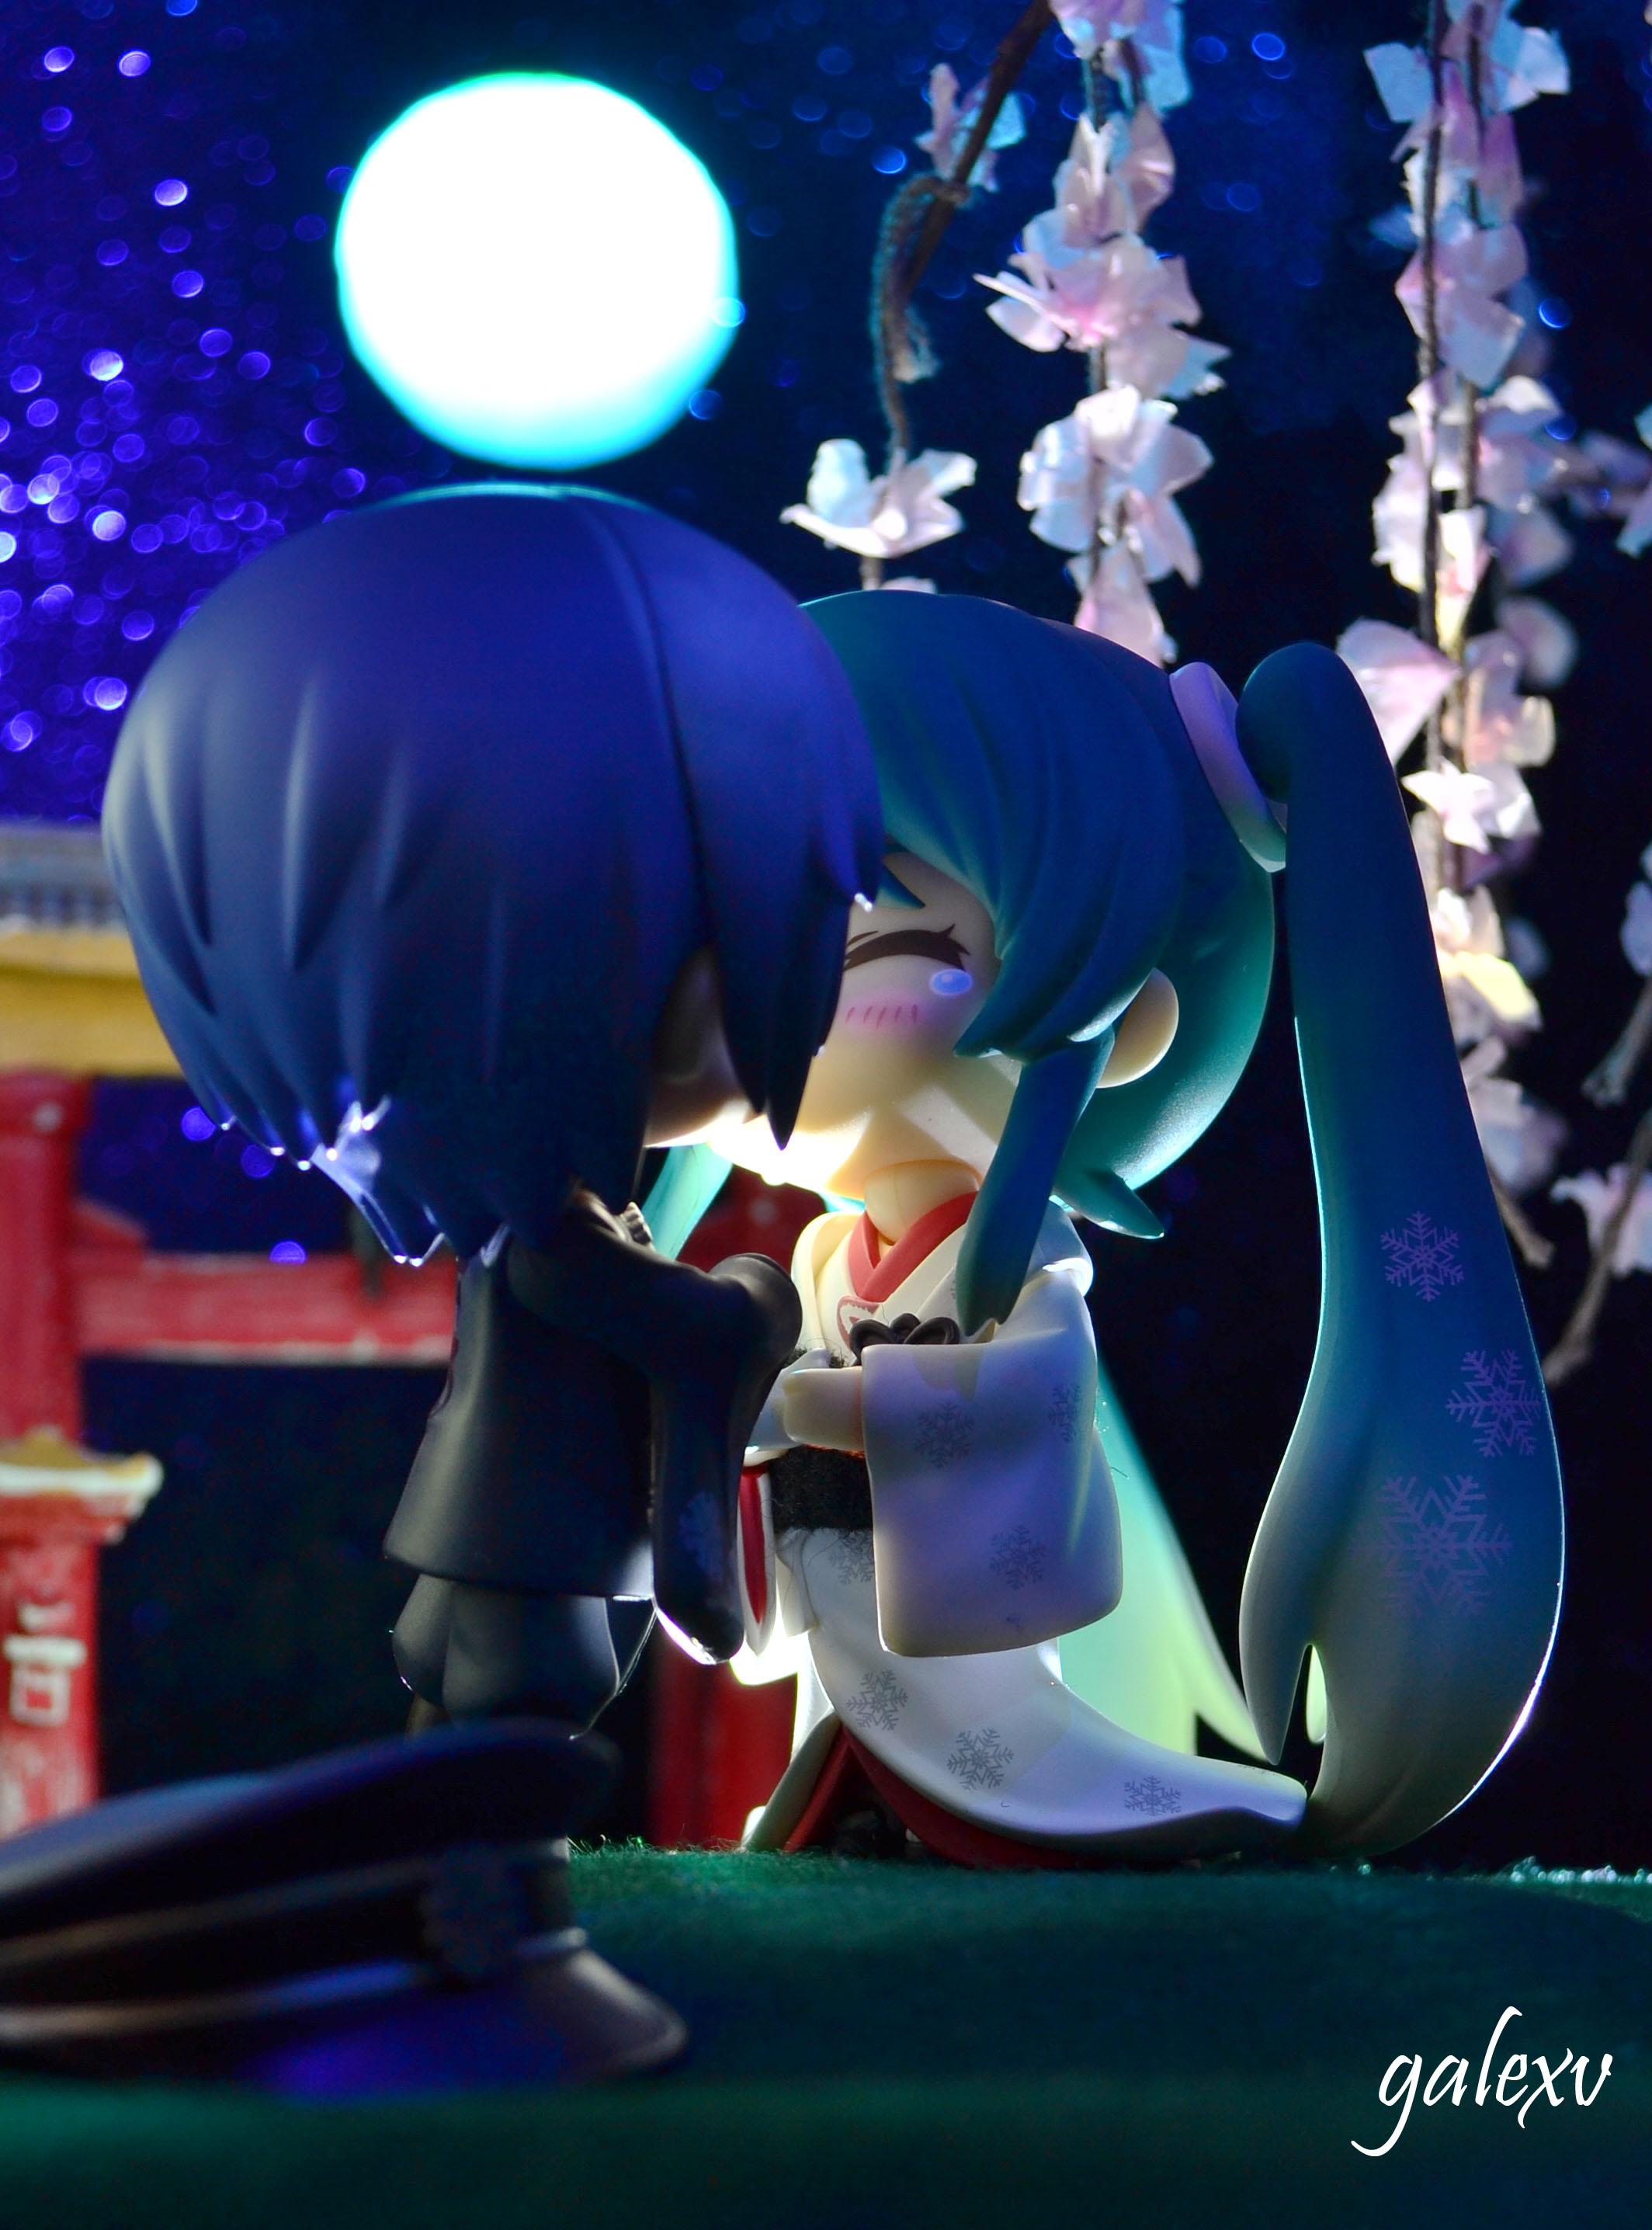 vocaloid moon nendoroid kiss kaito hatsune_miku good_smile_company nendoron crypton_future_media shichibee whiteflame itto_maru nishibu_hidetoshi